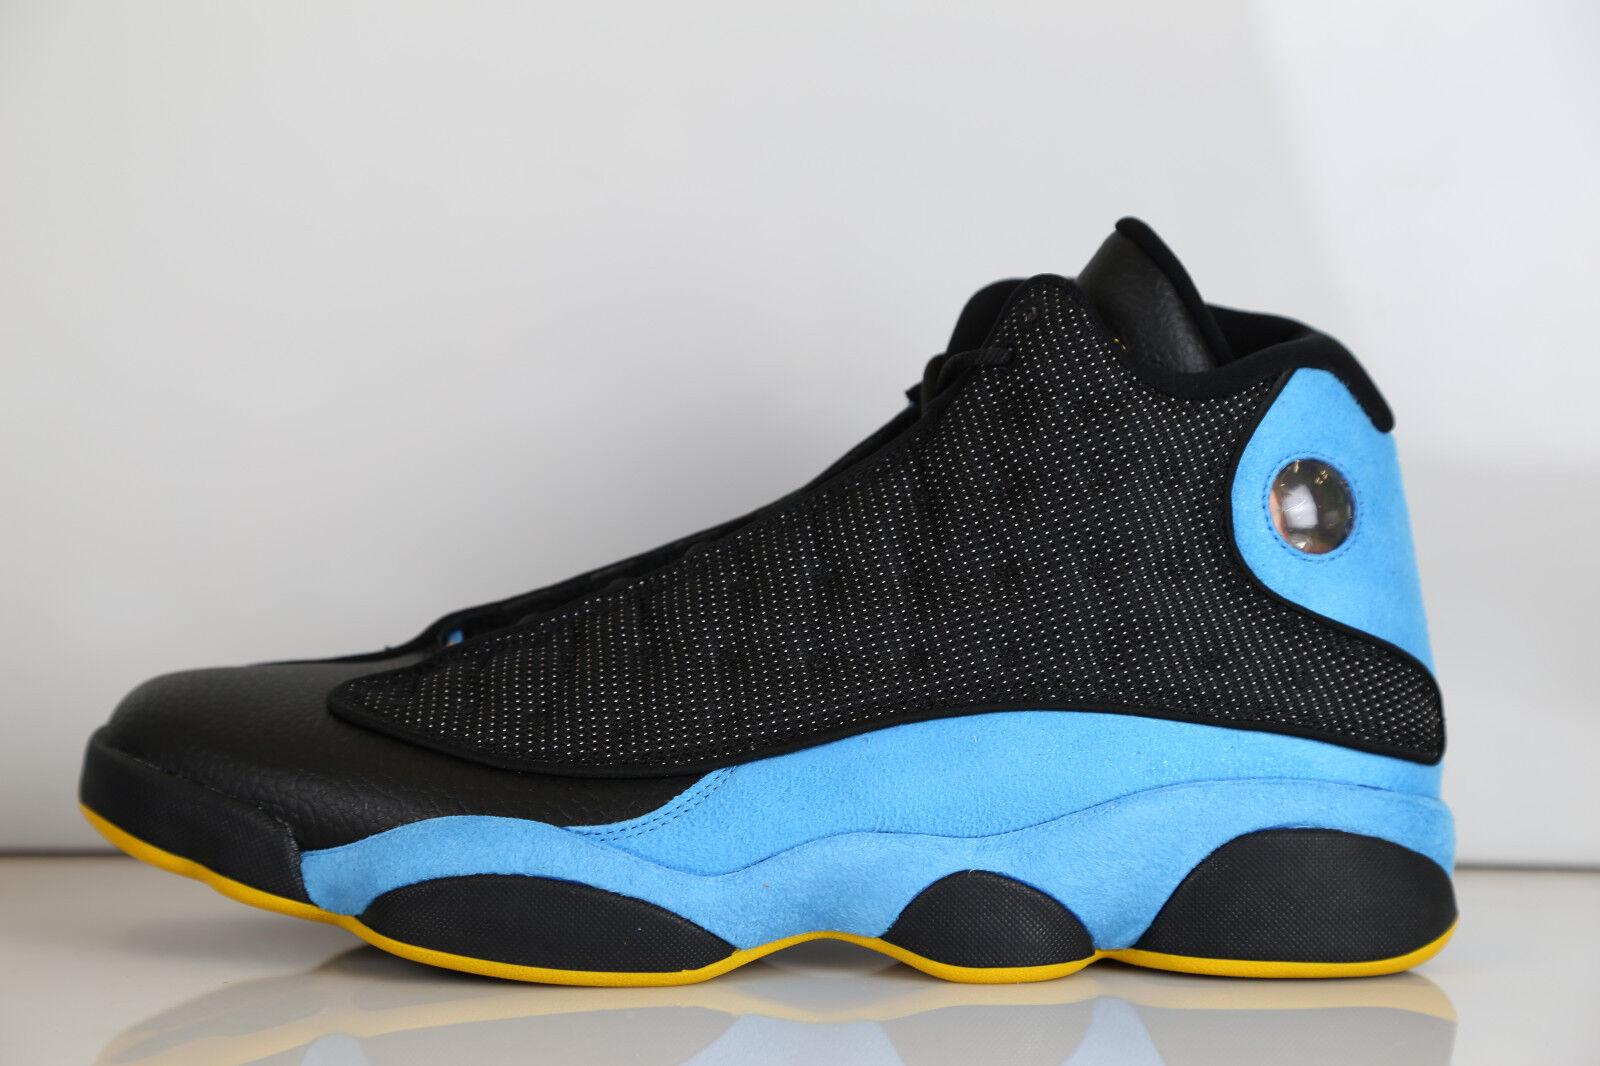 Nike Air Jordan Retro 13 CP Chris Paul PE Black 823902-015 8-14 3 11 cp3